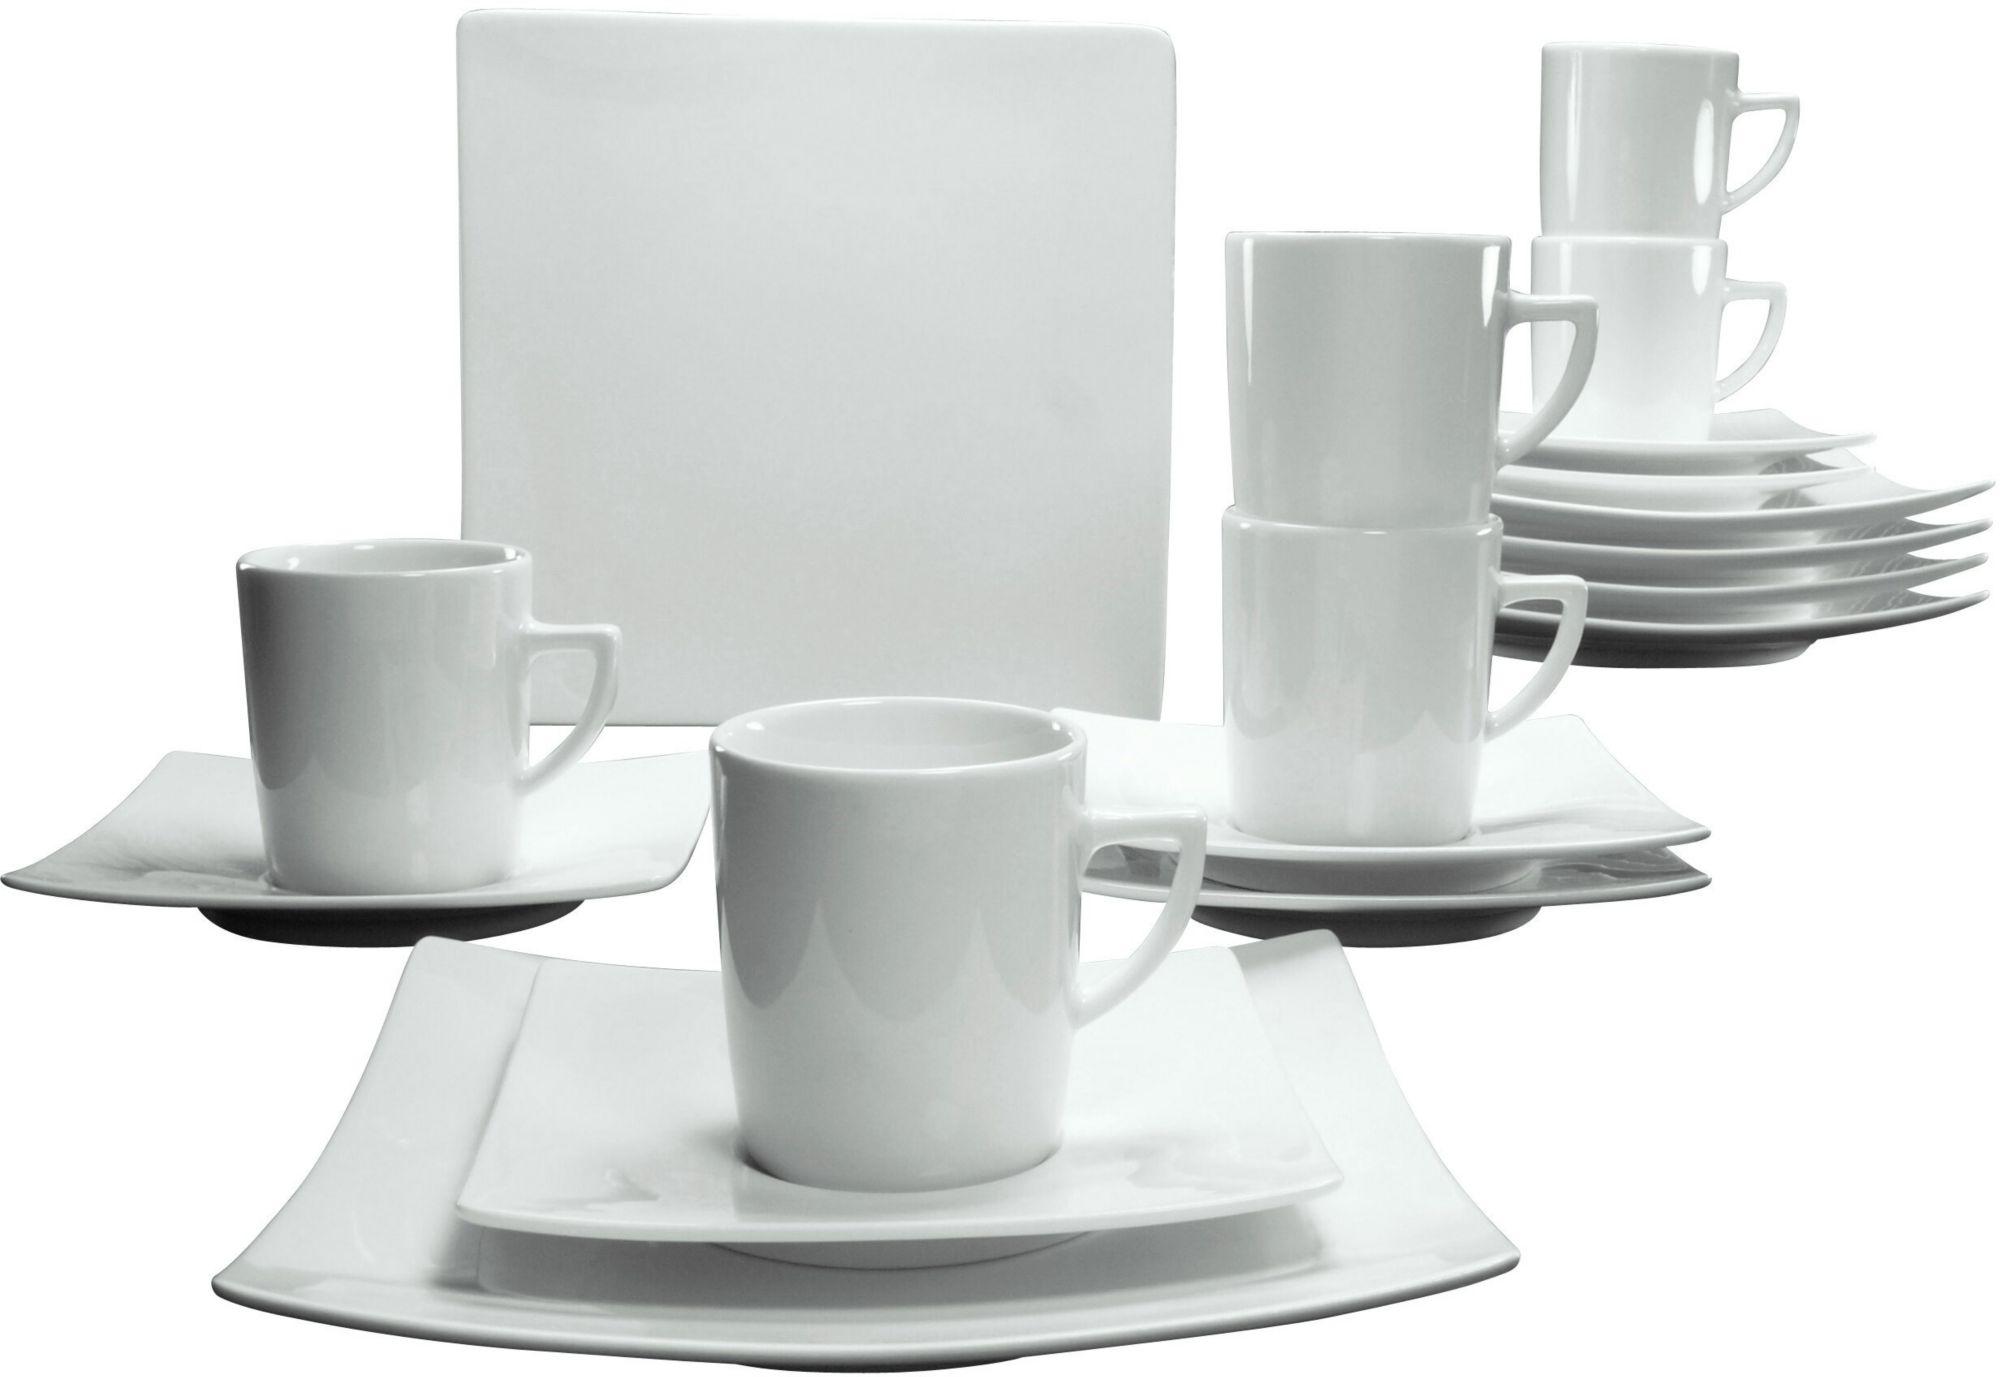 CREATABLE CreaTable Kaffeeservice, Porzellan, 18 Teile, »NEW ELEGANCE«